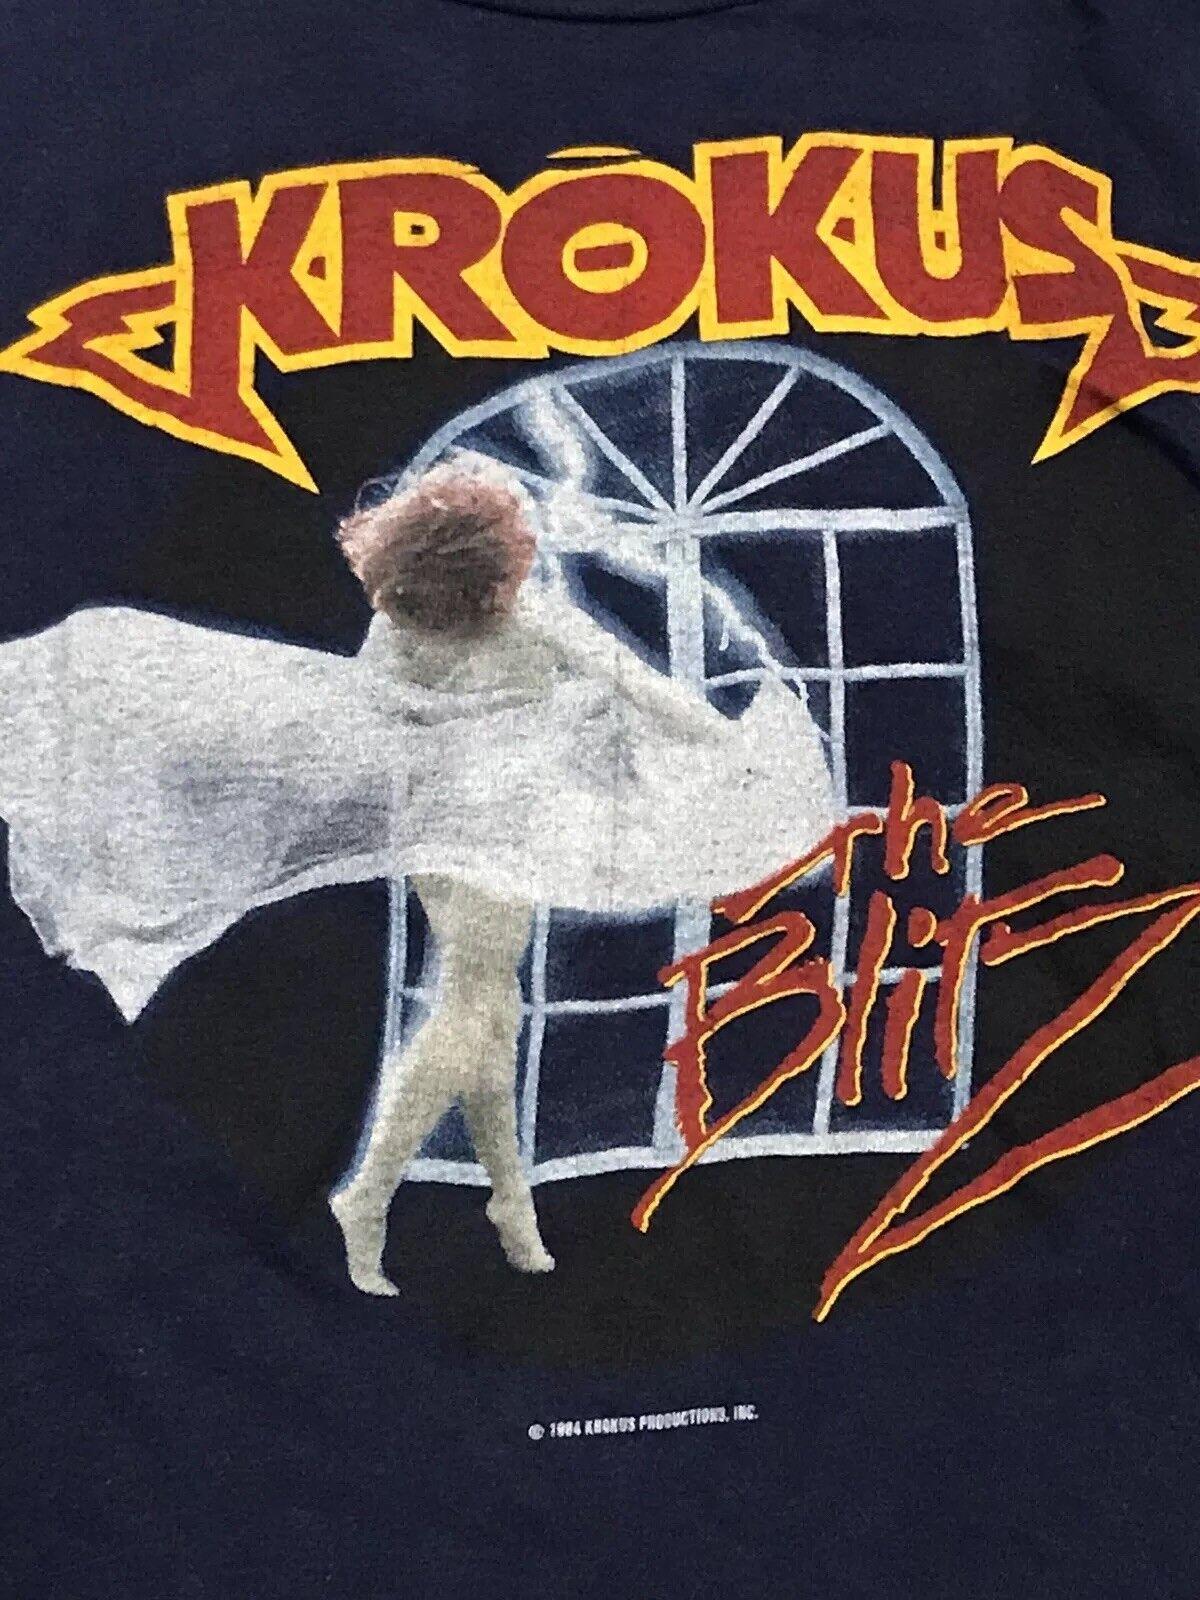 Krokus Vtg Tour Shirt LA Guns Roses ACDC Ozzy Crue Ratt Jovi Poison Leppard KISS